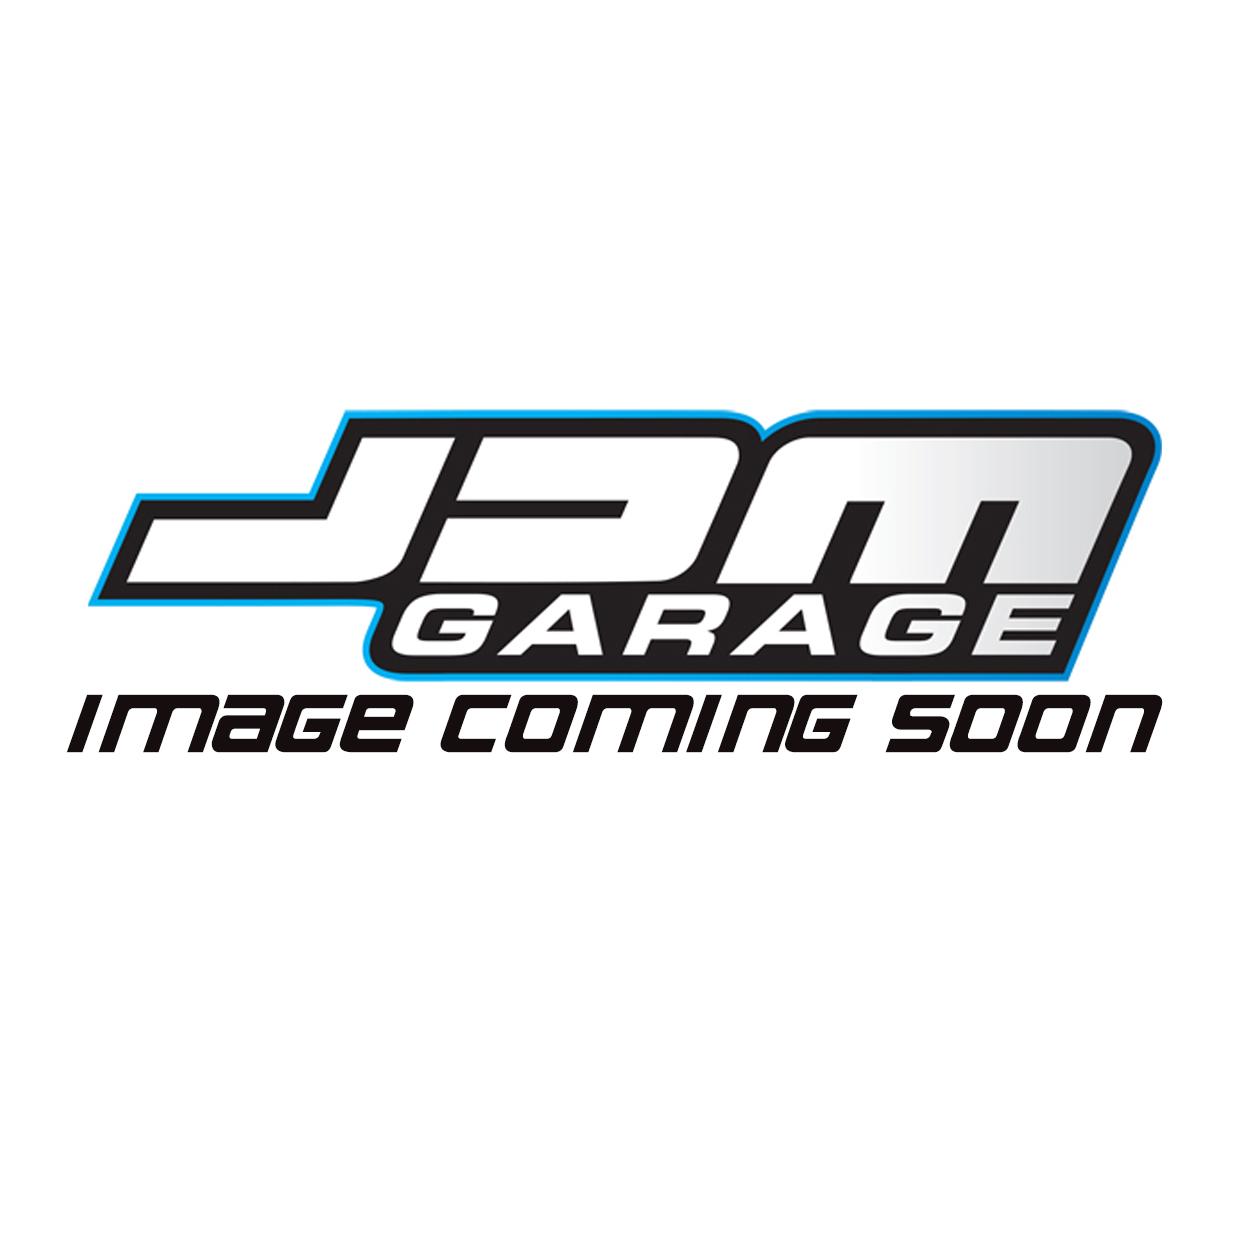 Drift Max & Driftmax Pro Gearbox Mount For Nissan Silvia S13 / S14 / S15 SR20DET